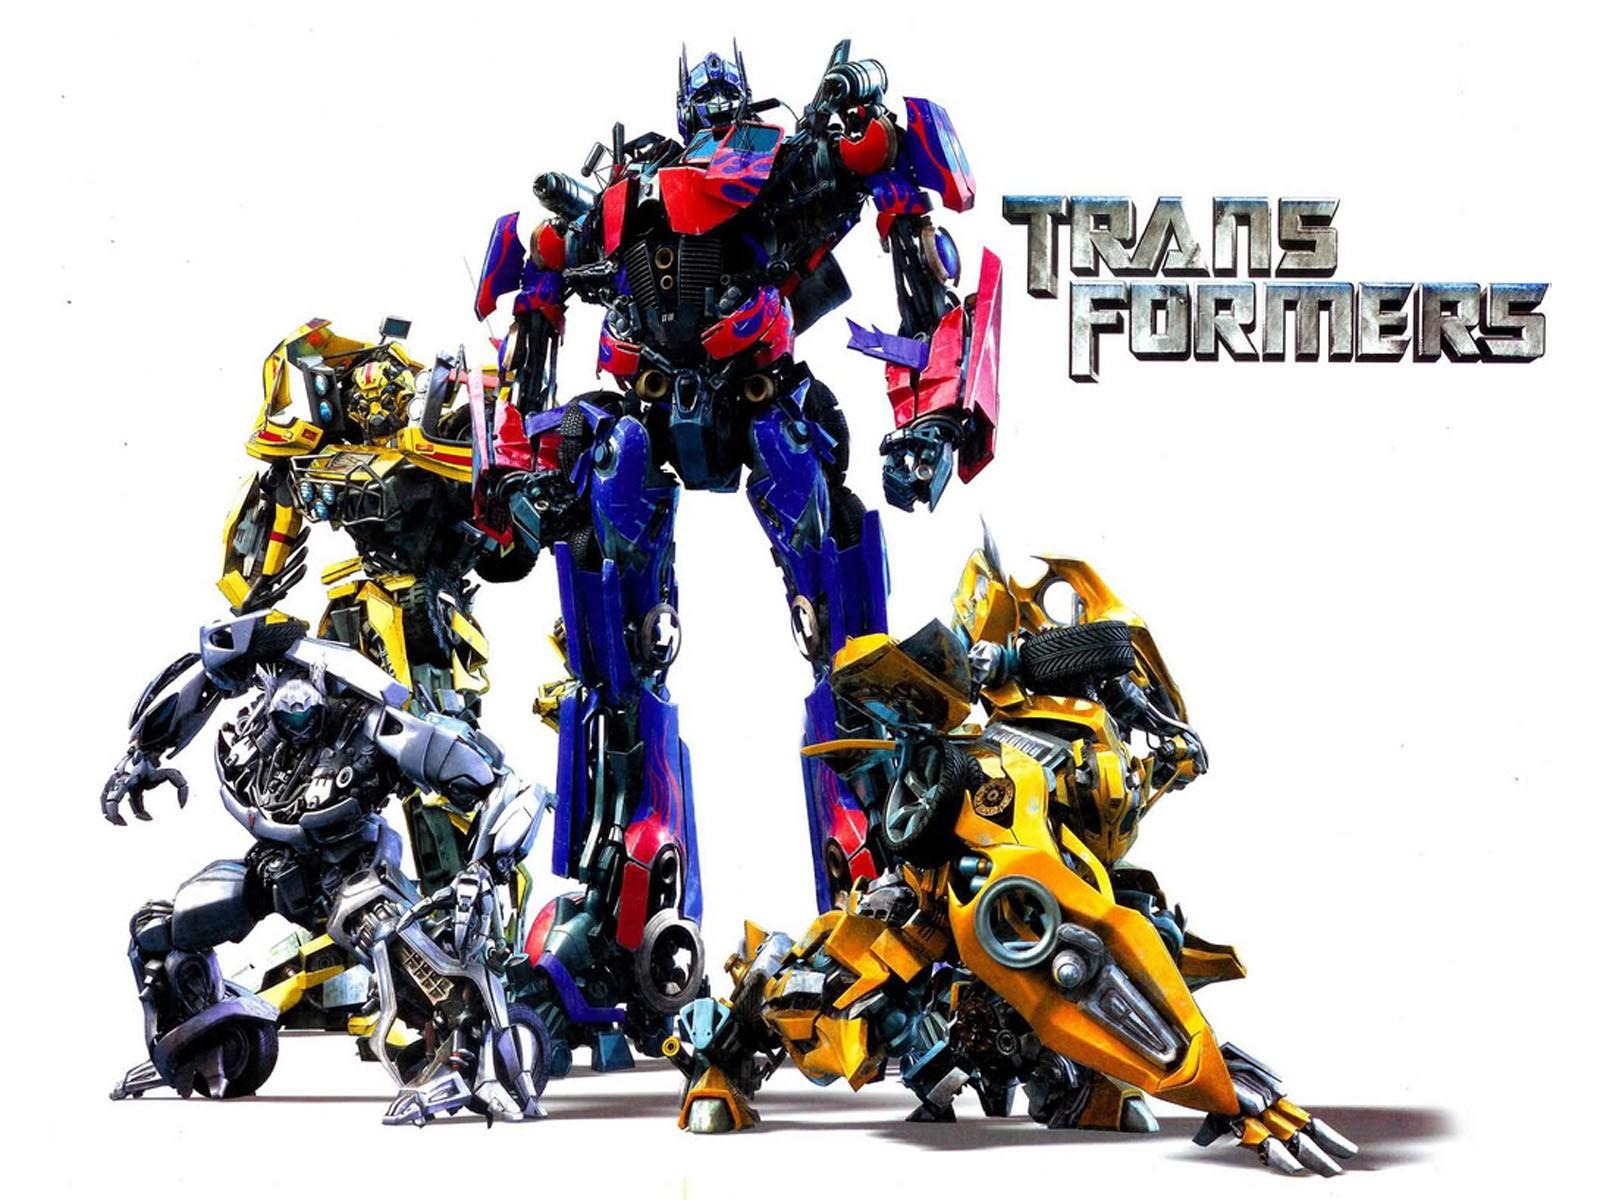 Transformers Autobots Hd Wallpaper High Definition